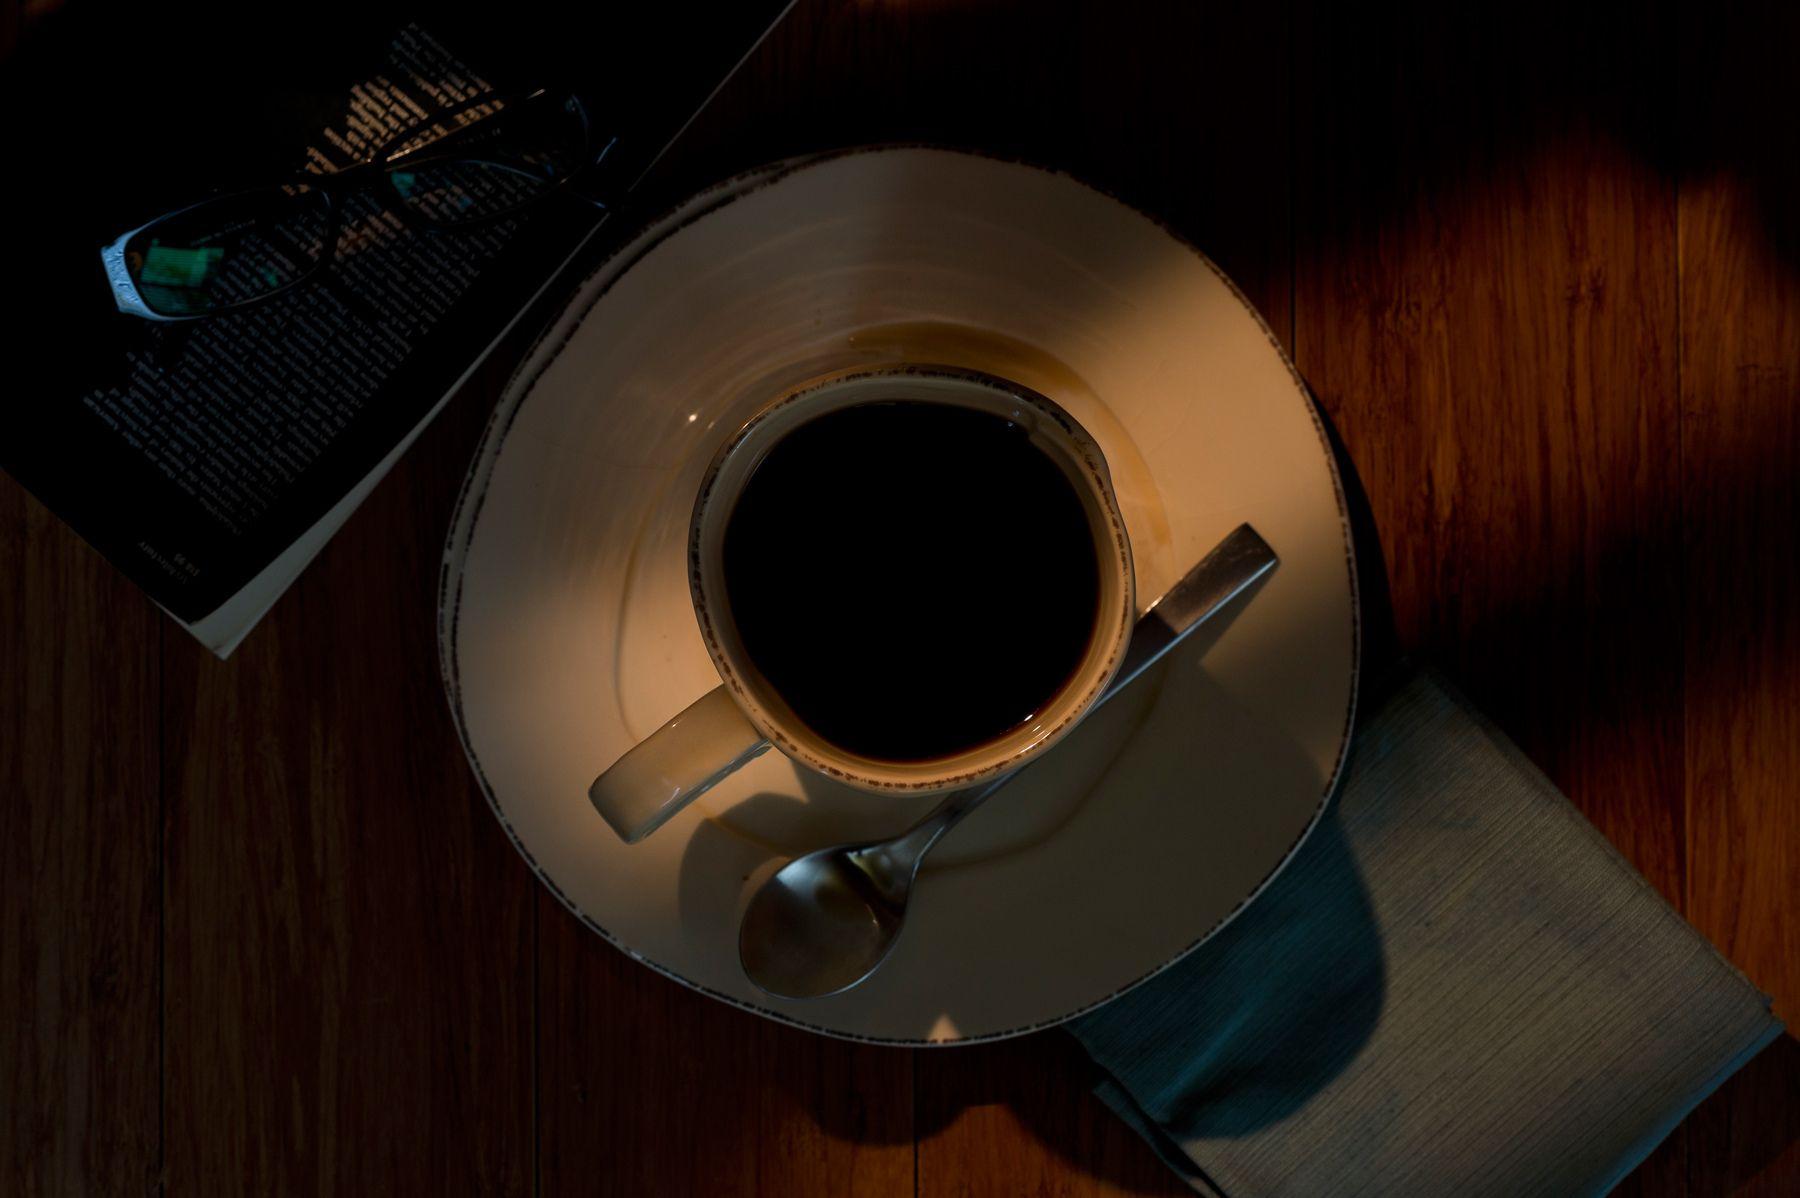 1food_and_drink__coffee_dawn_02__nikon_d4_dsc5694